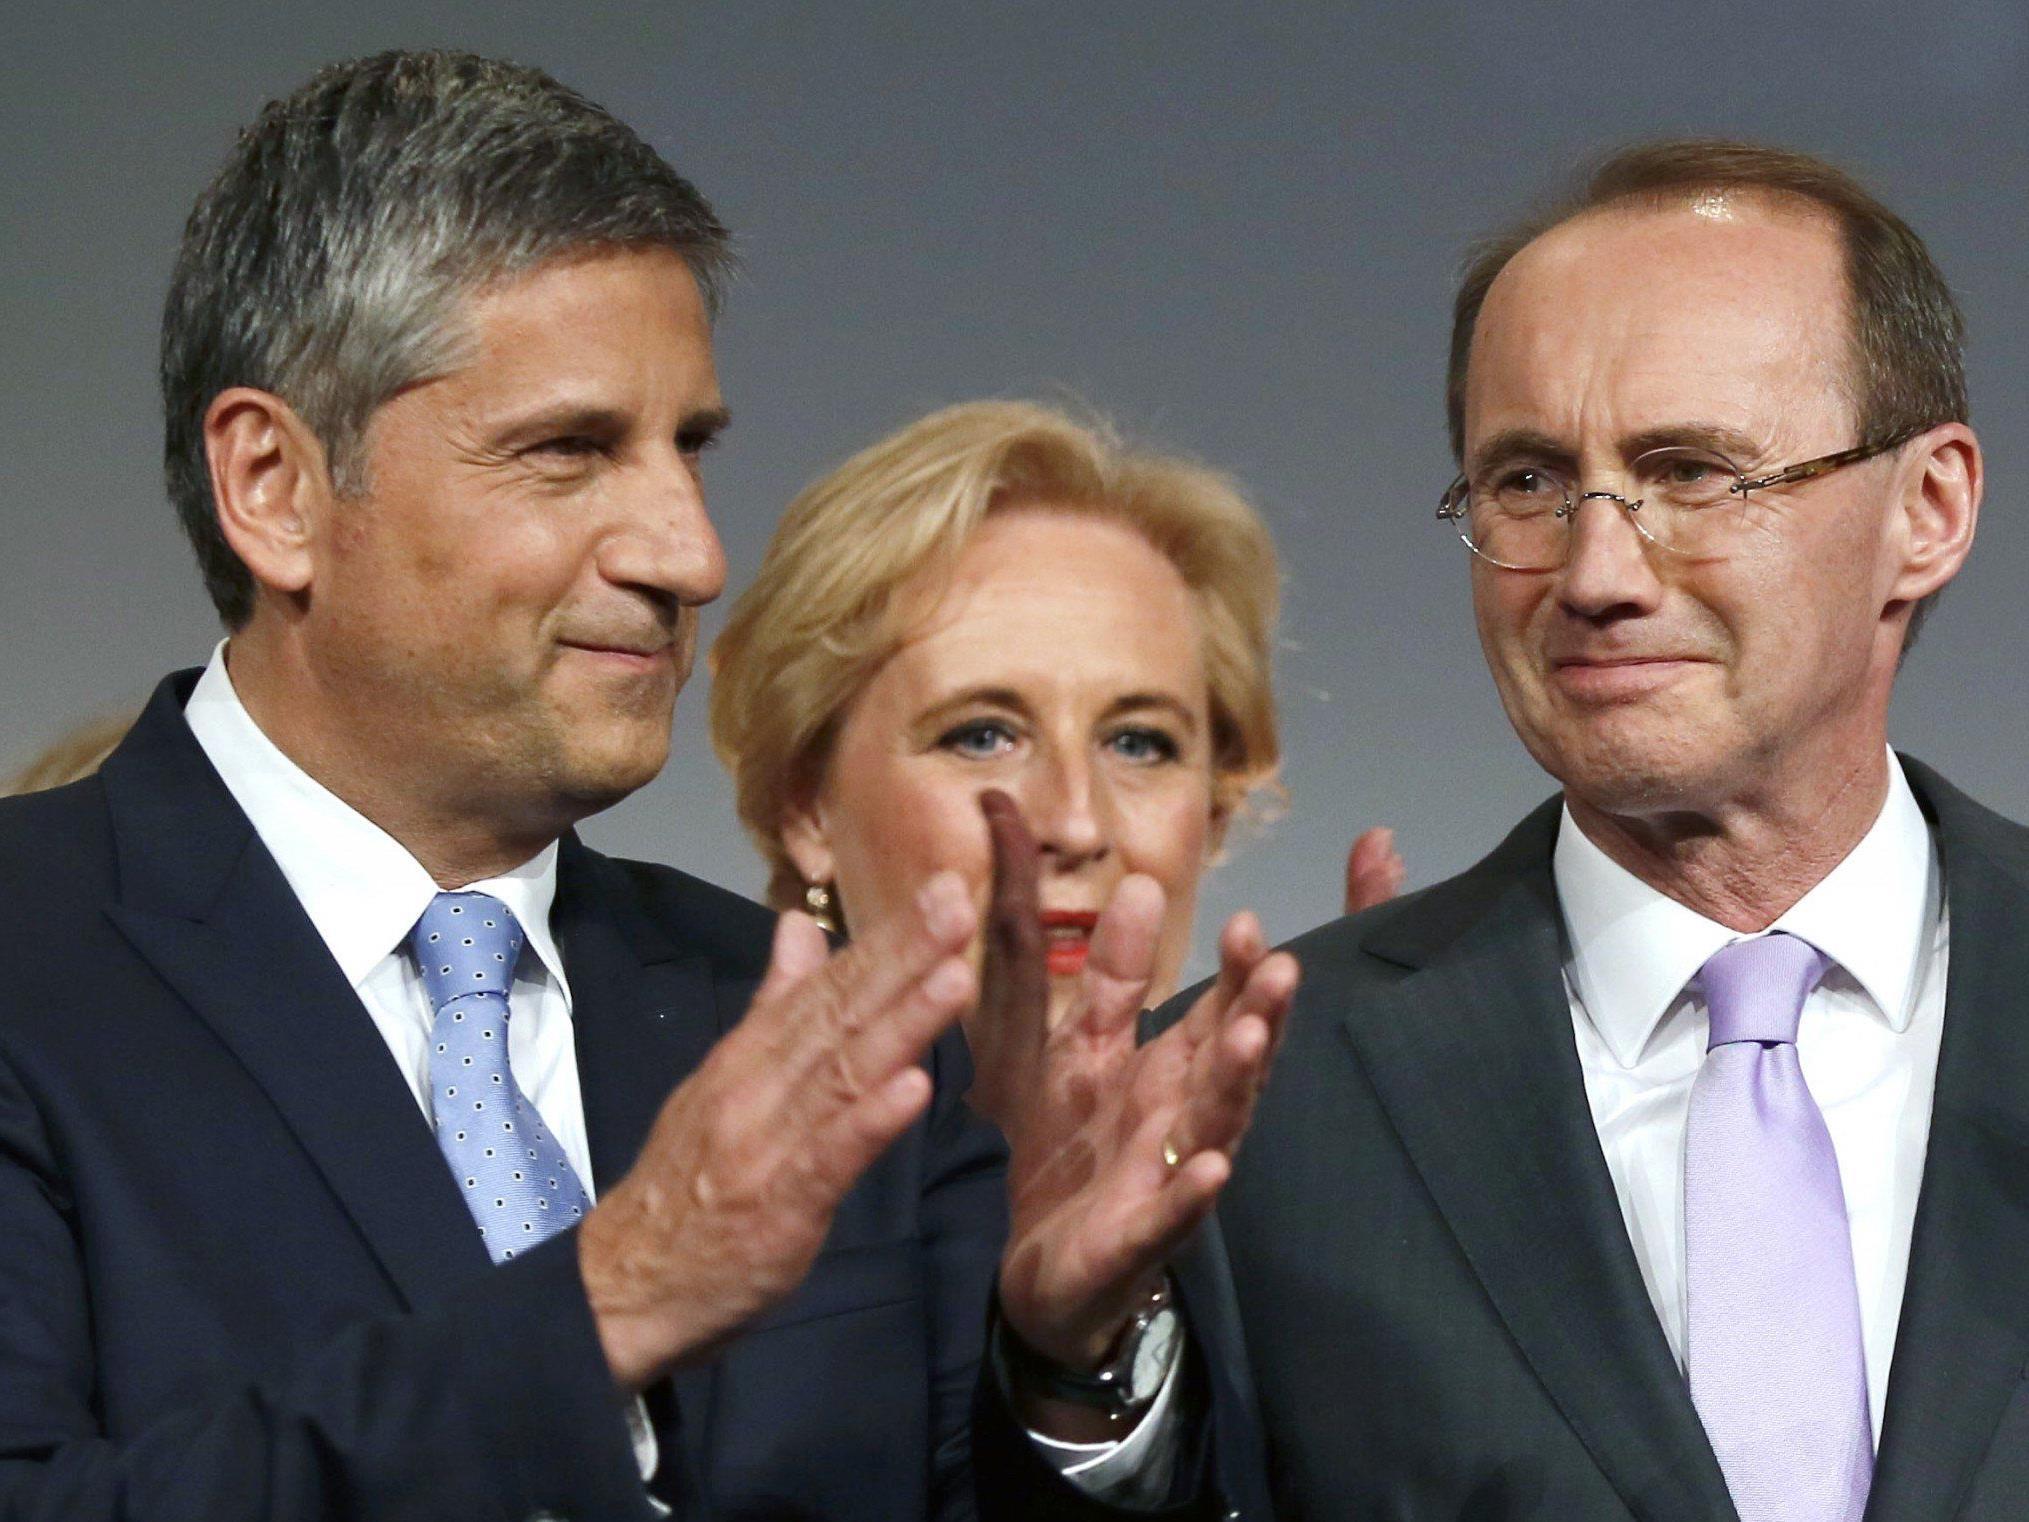 Europawahl 2014: ÖVP startete am Freitag den Intensivwahlkampf.